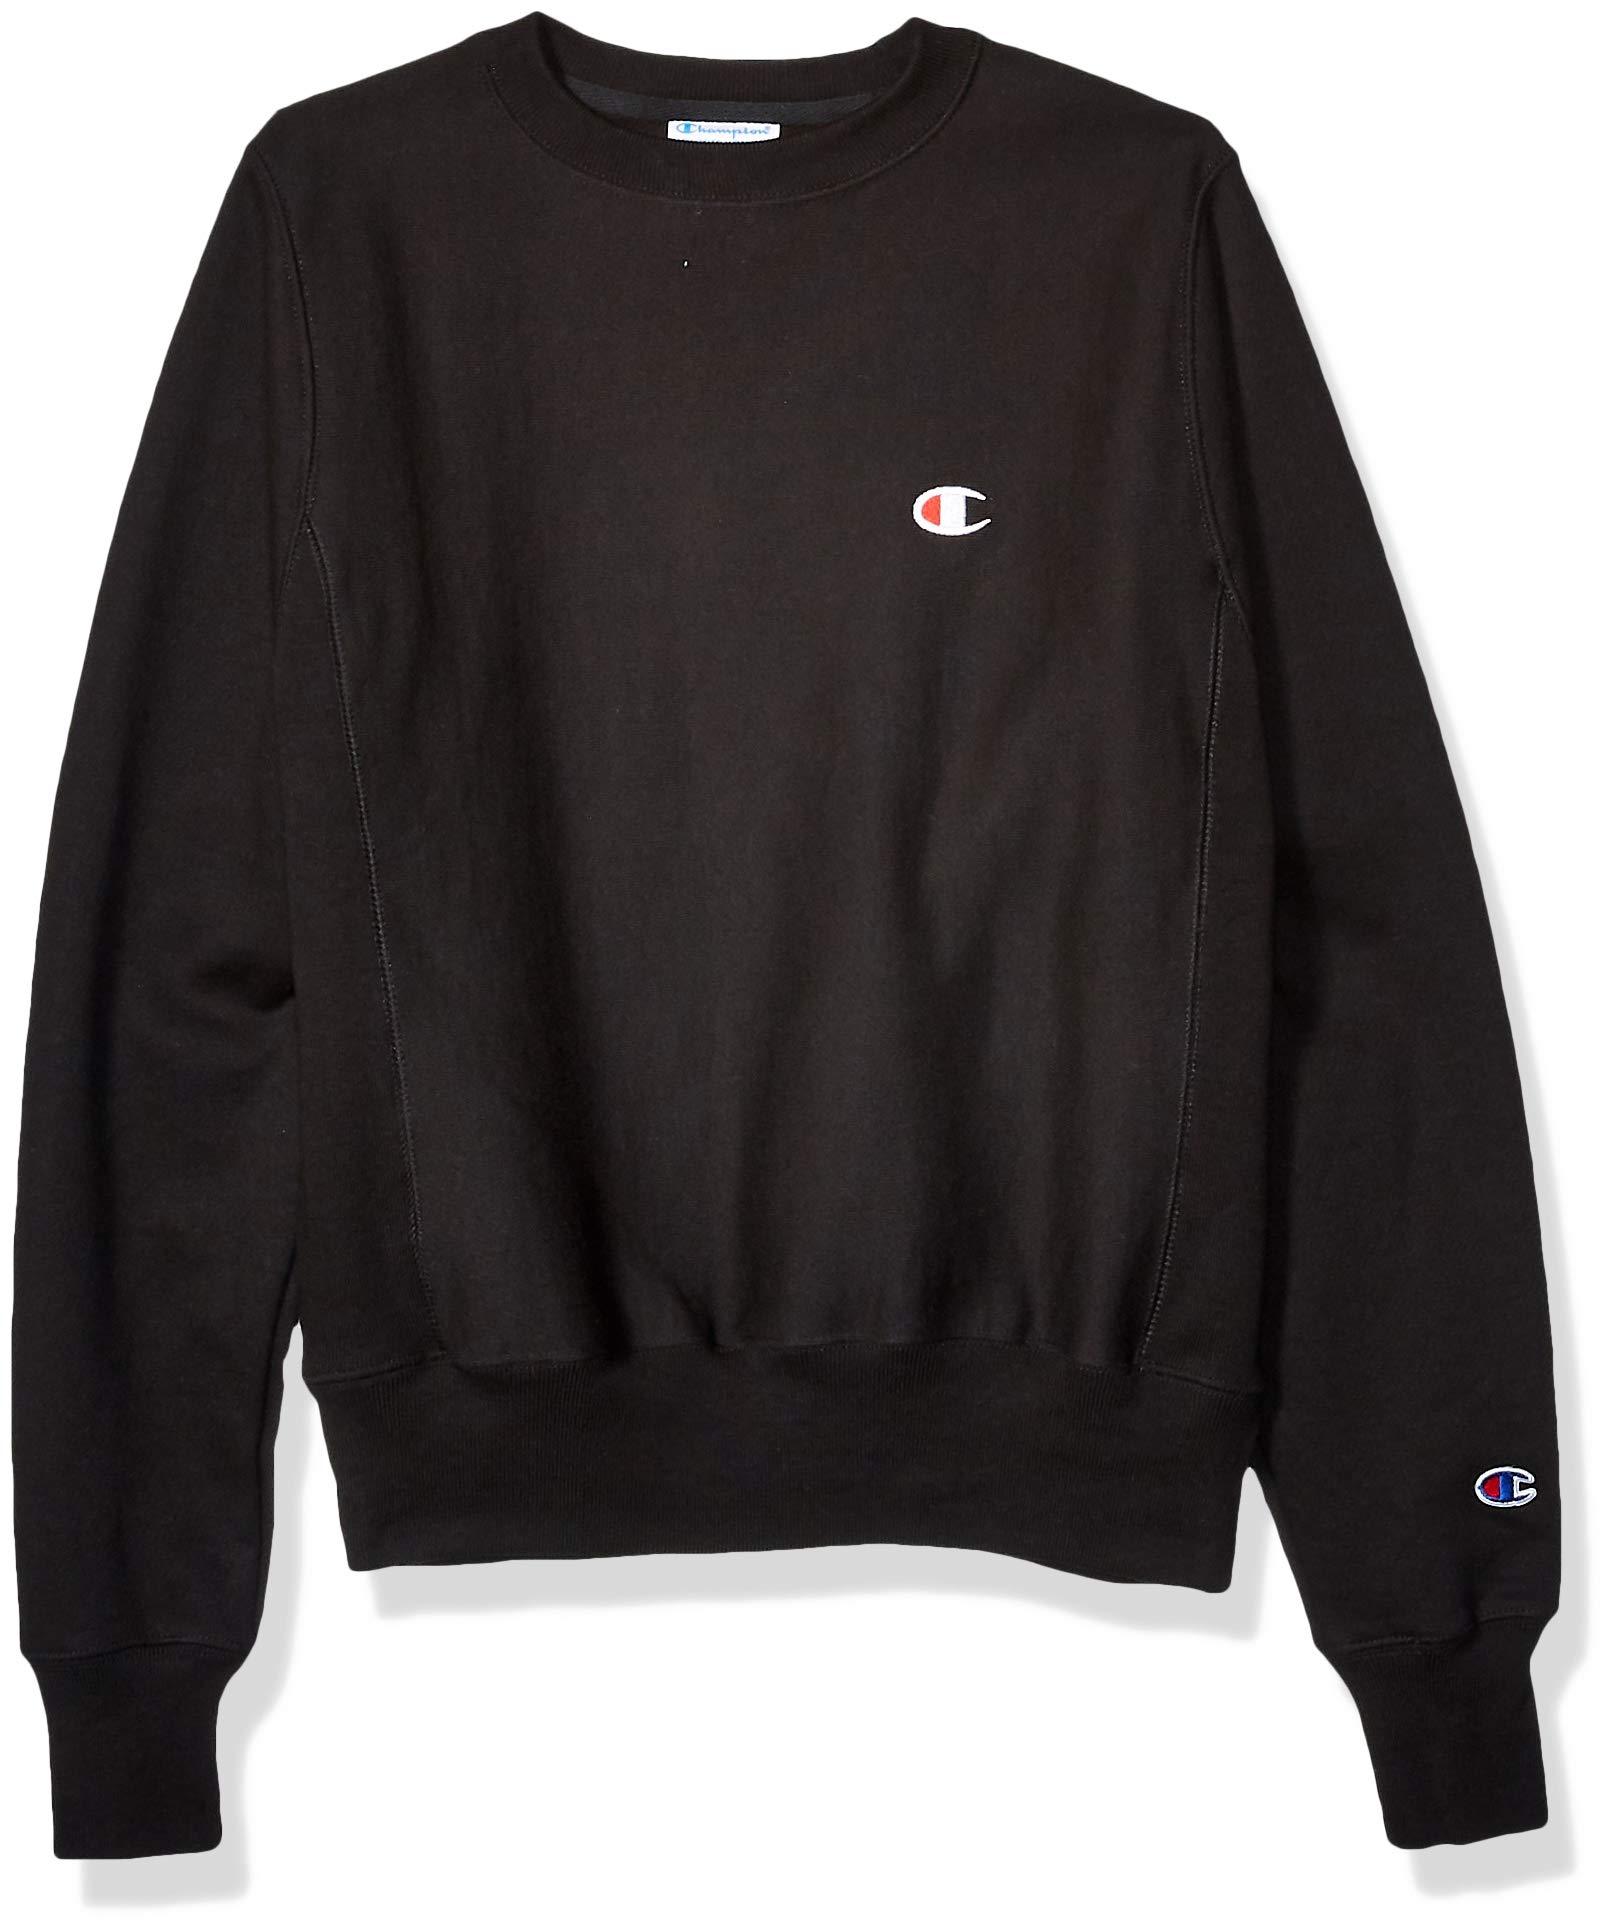 Champion LIFE Men's Reverse Weave Sweatshirt, X-Small Black by Champion LIFE